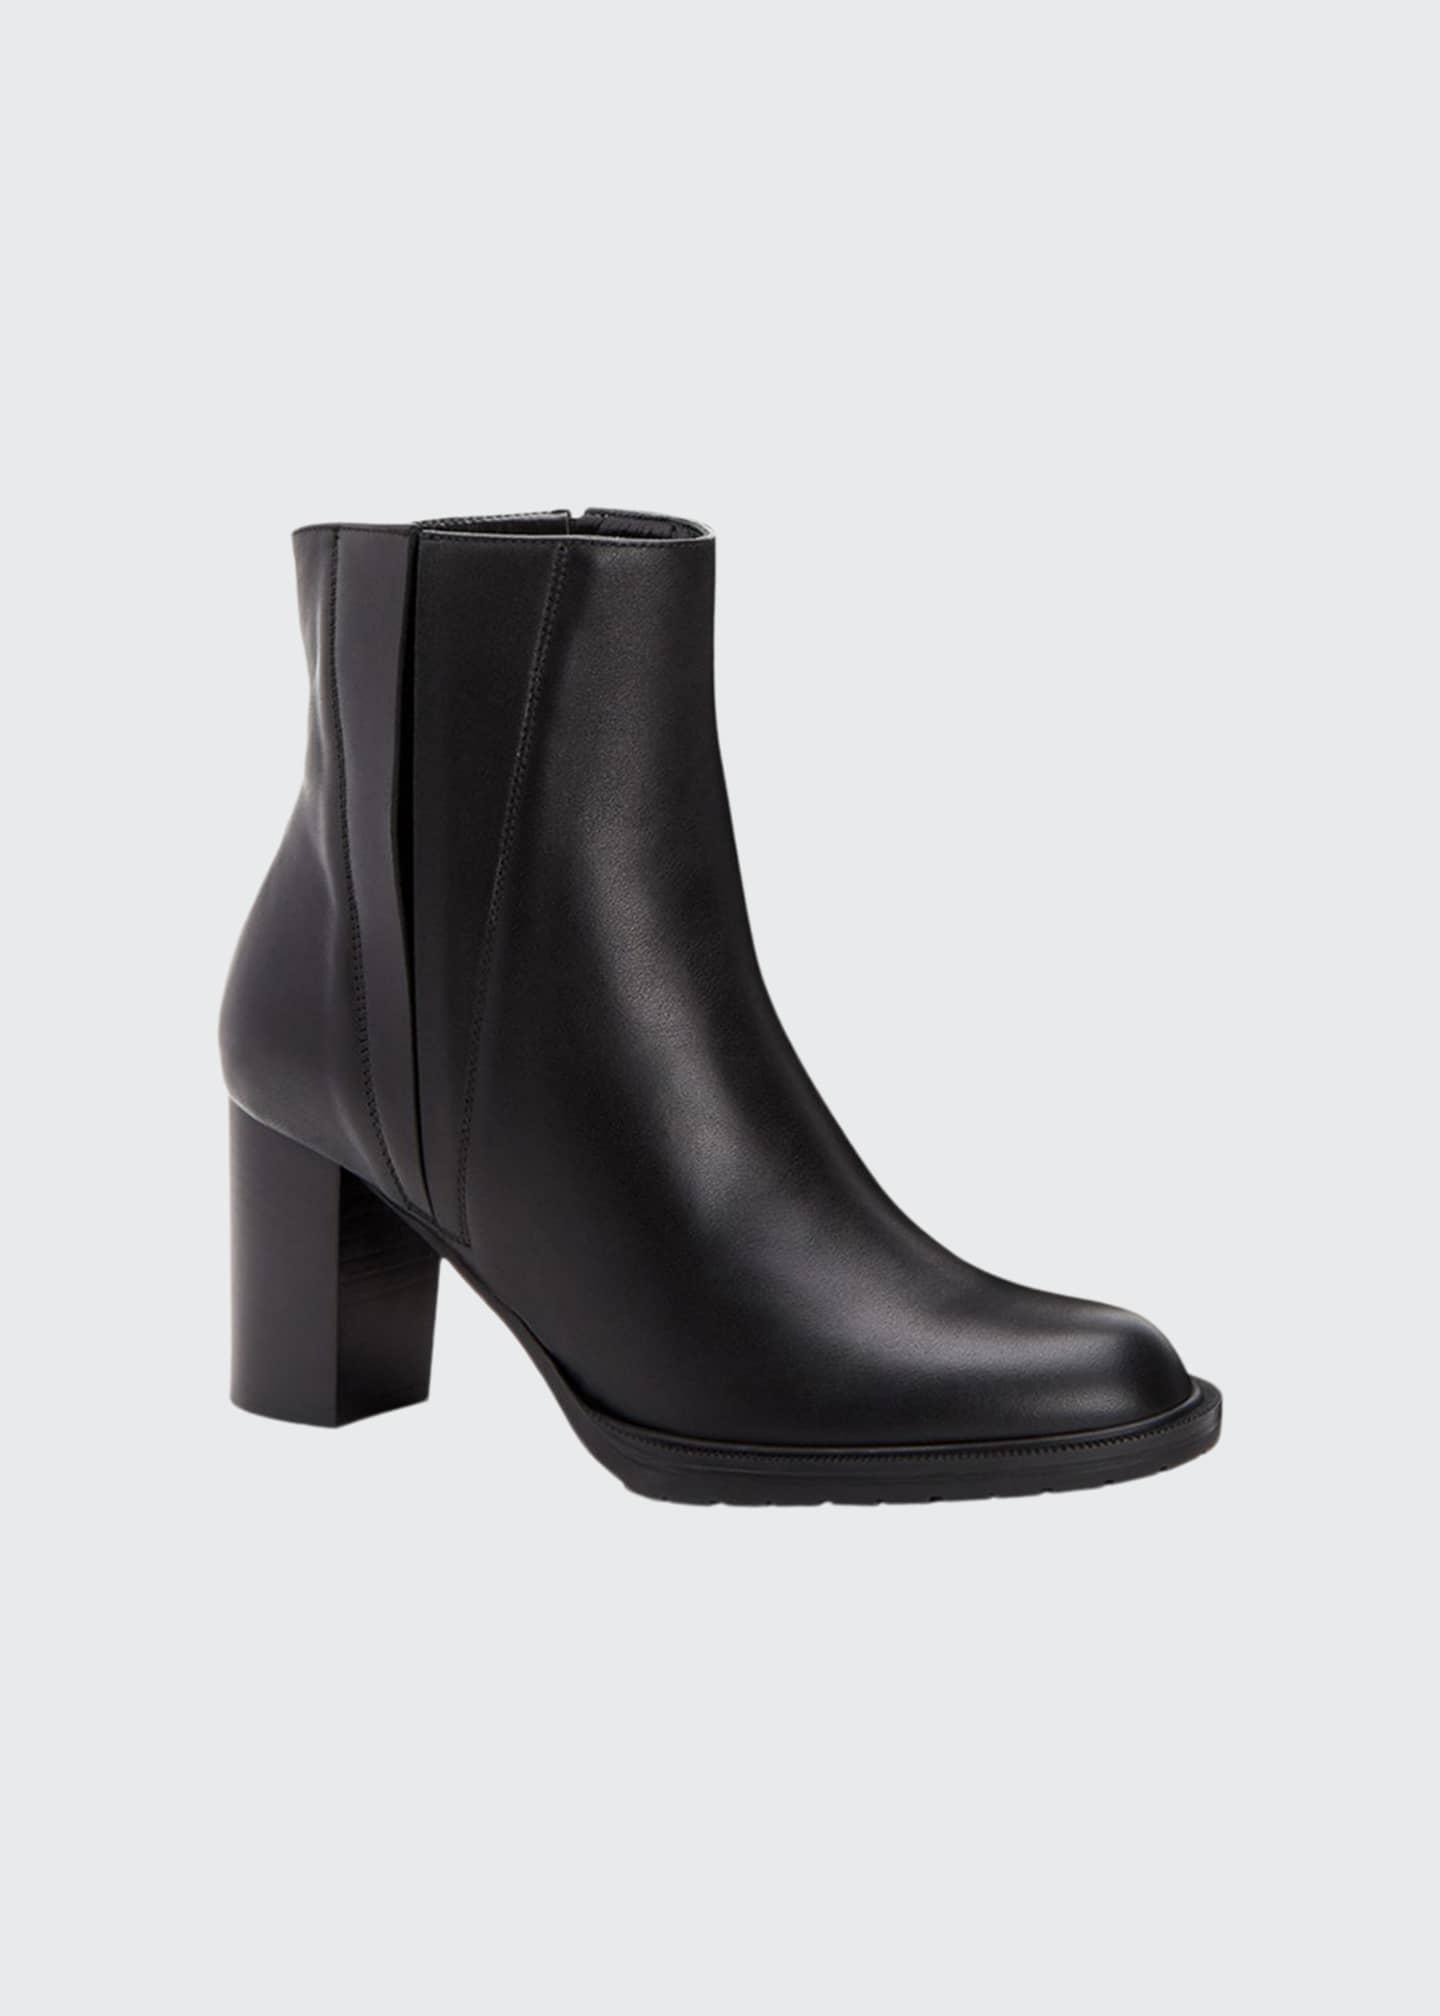 Aquatalia Betsy Split Leather Booties